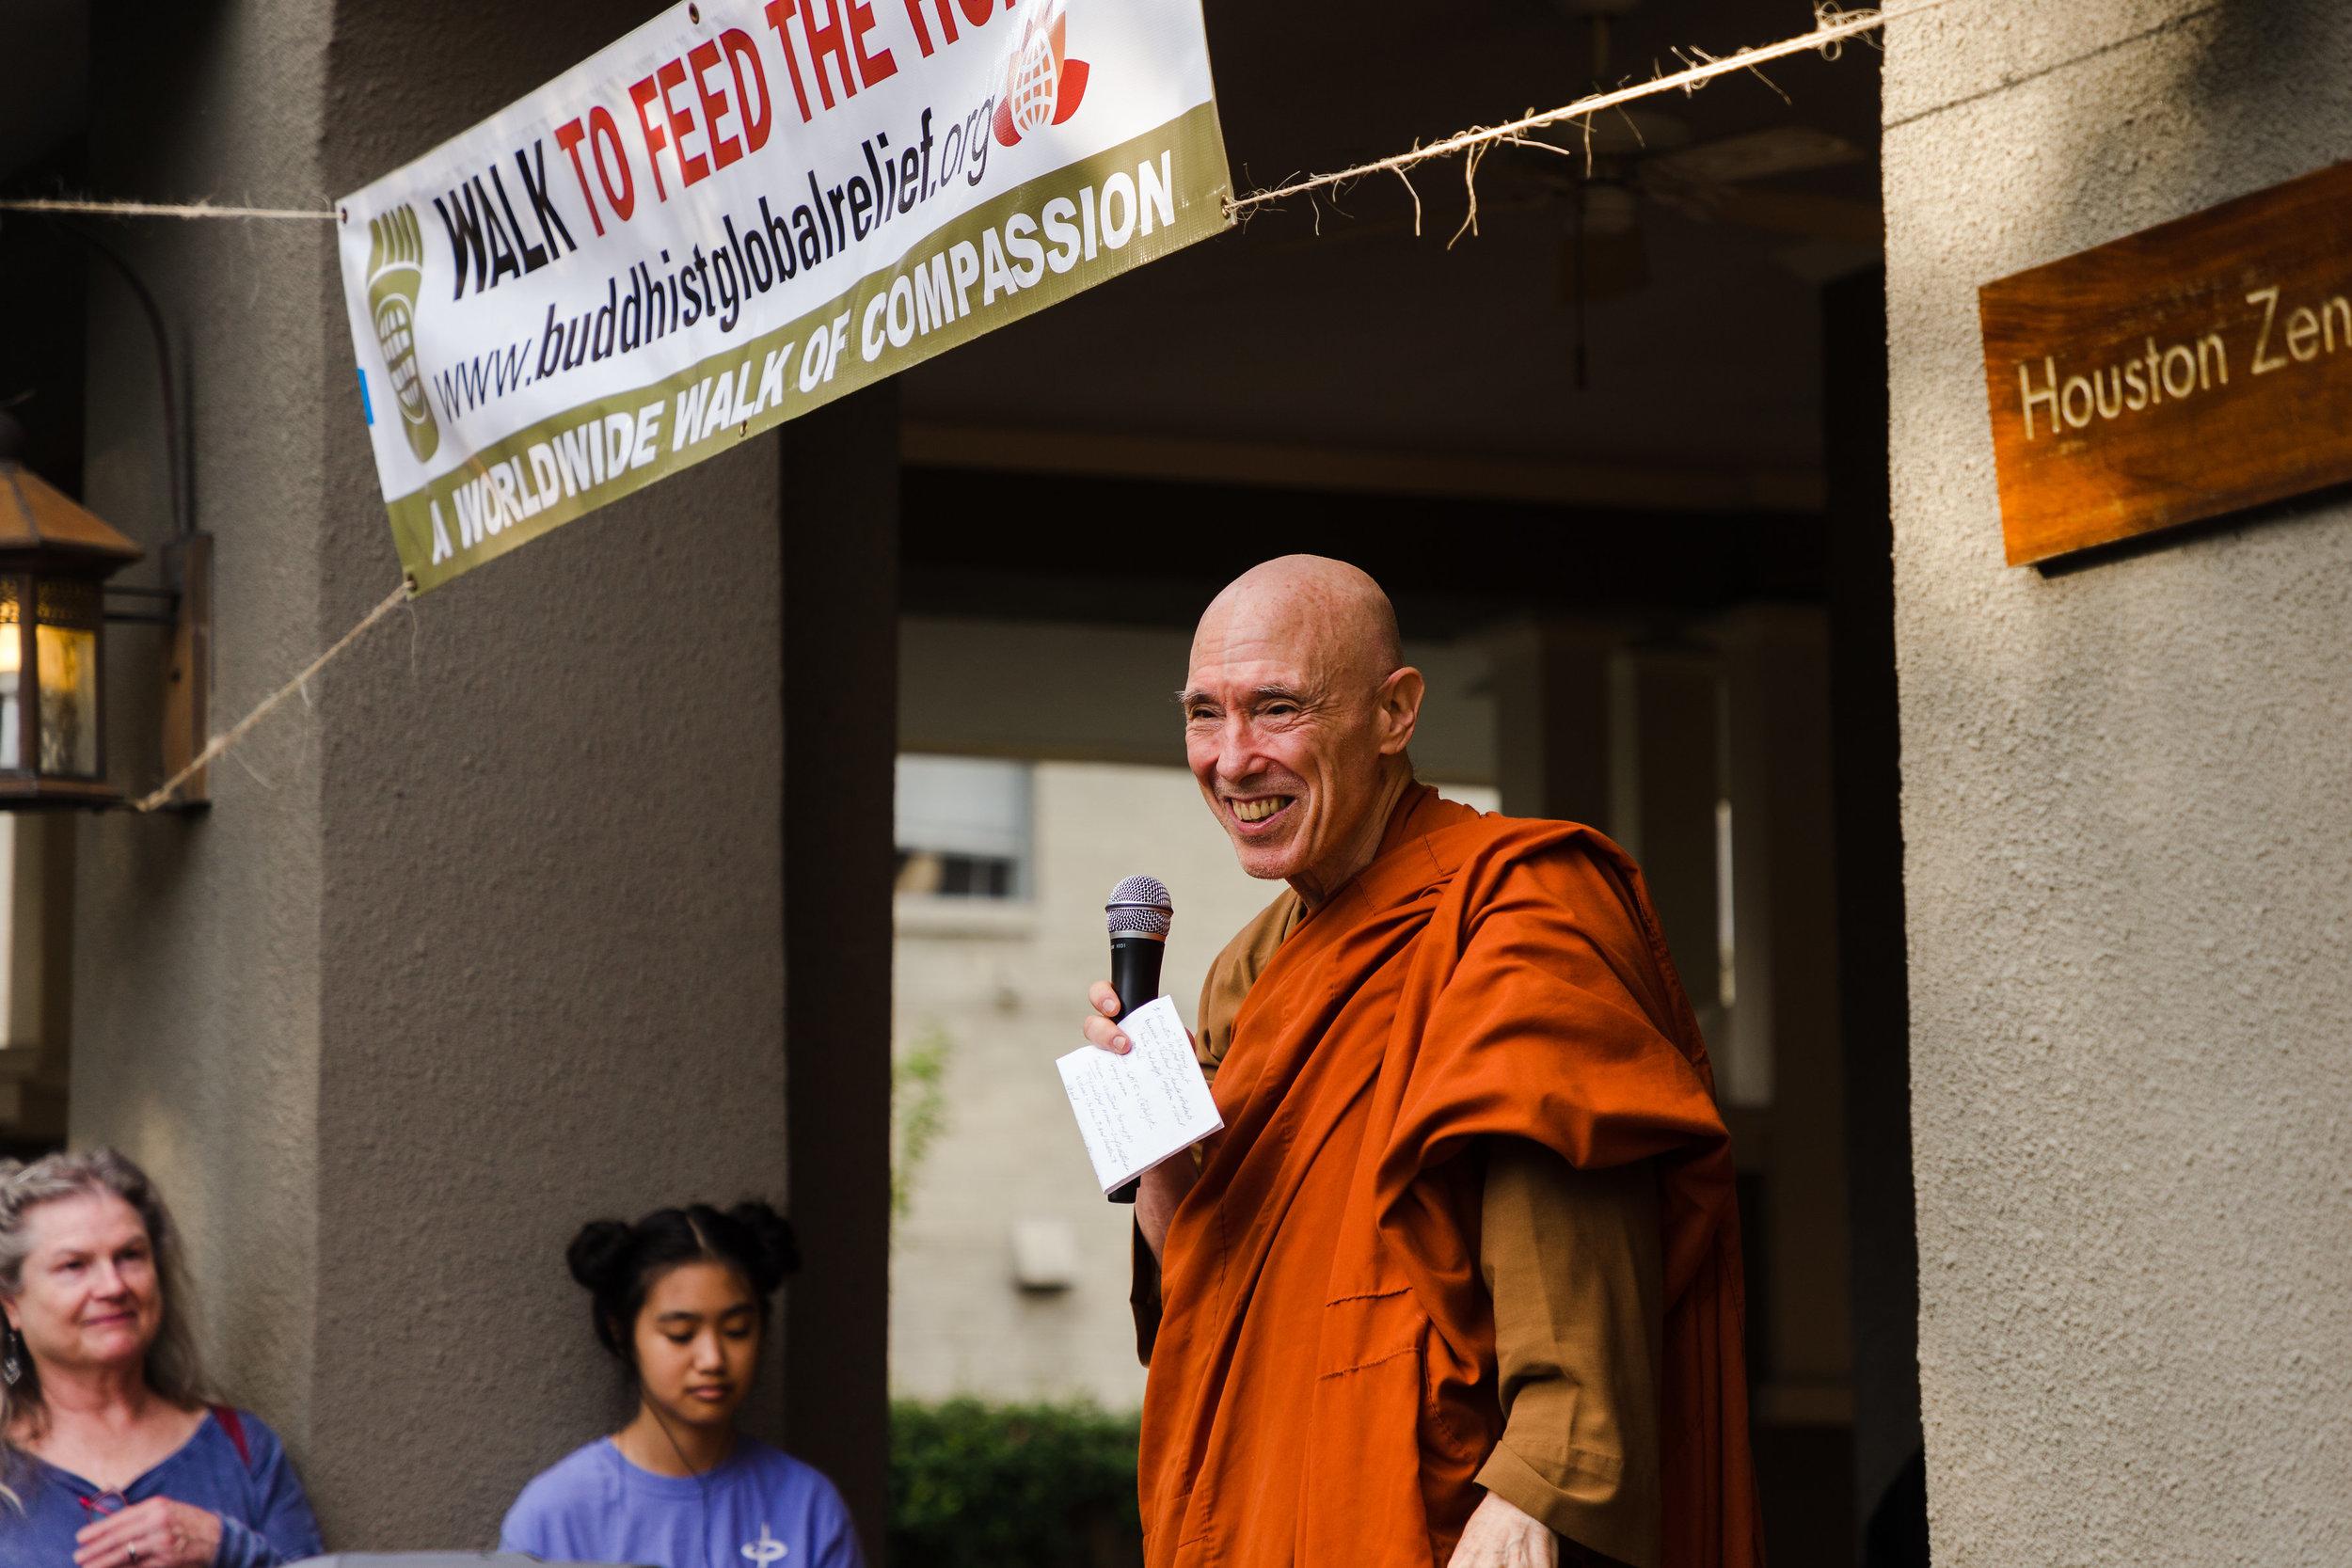 Bhikkhu-Bodhi-Global-Relief-Houston-Zen-Walk-35.jpg